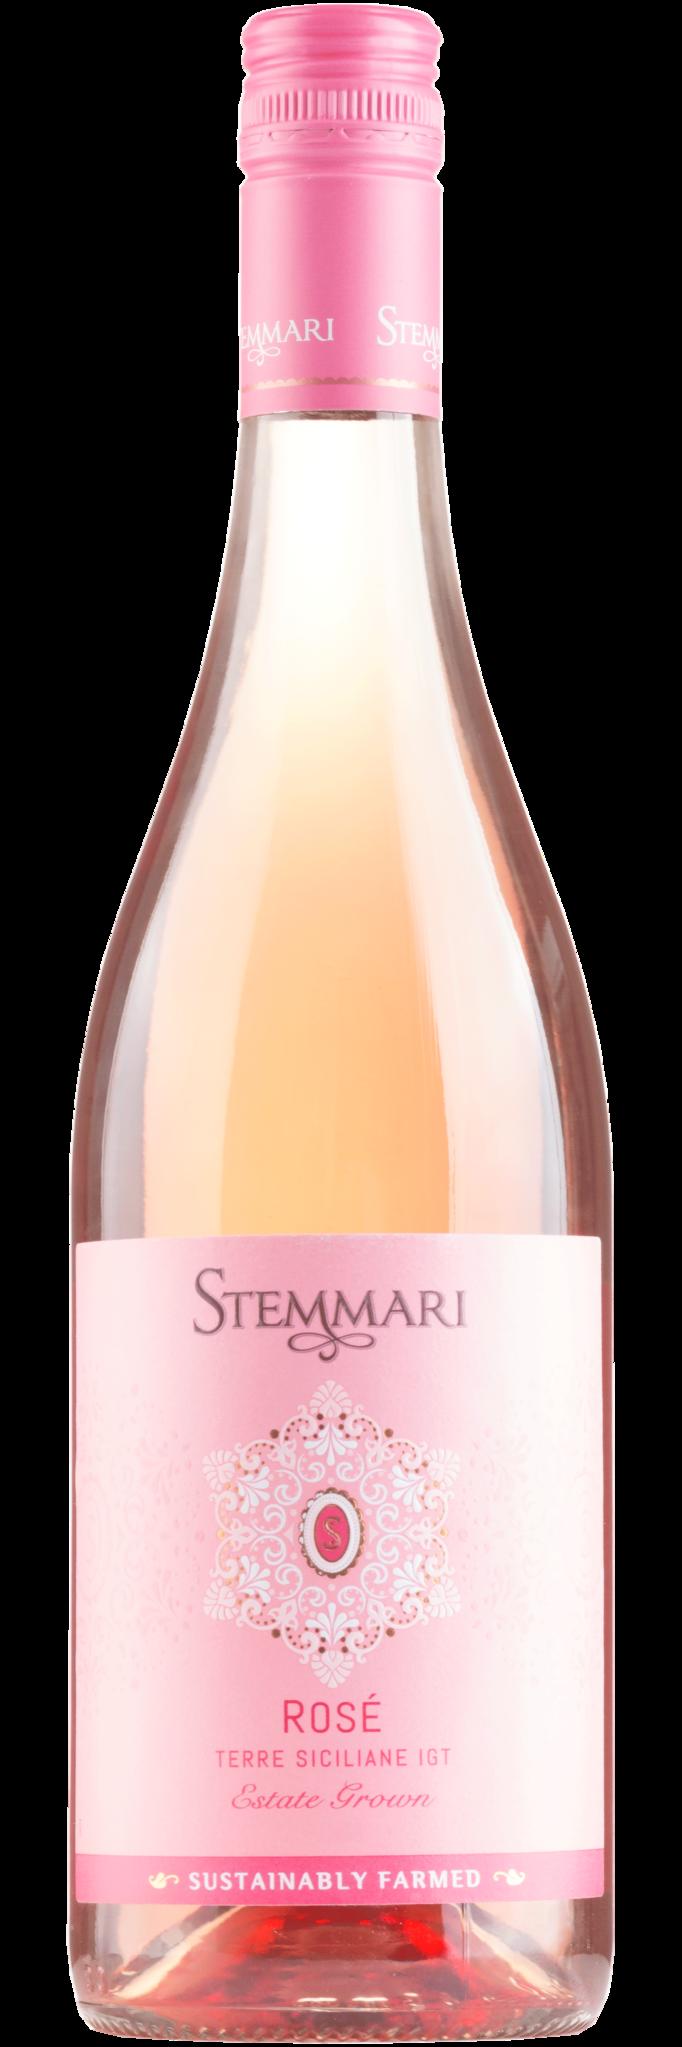 Stemmari /Feudo Arancio), Sizilien 2019 Nero d'Avola Rosé Stemmari